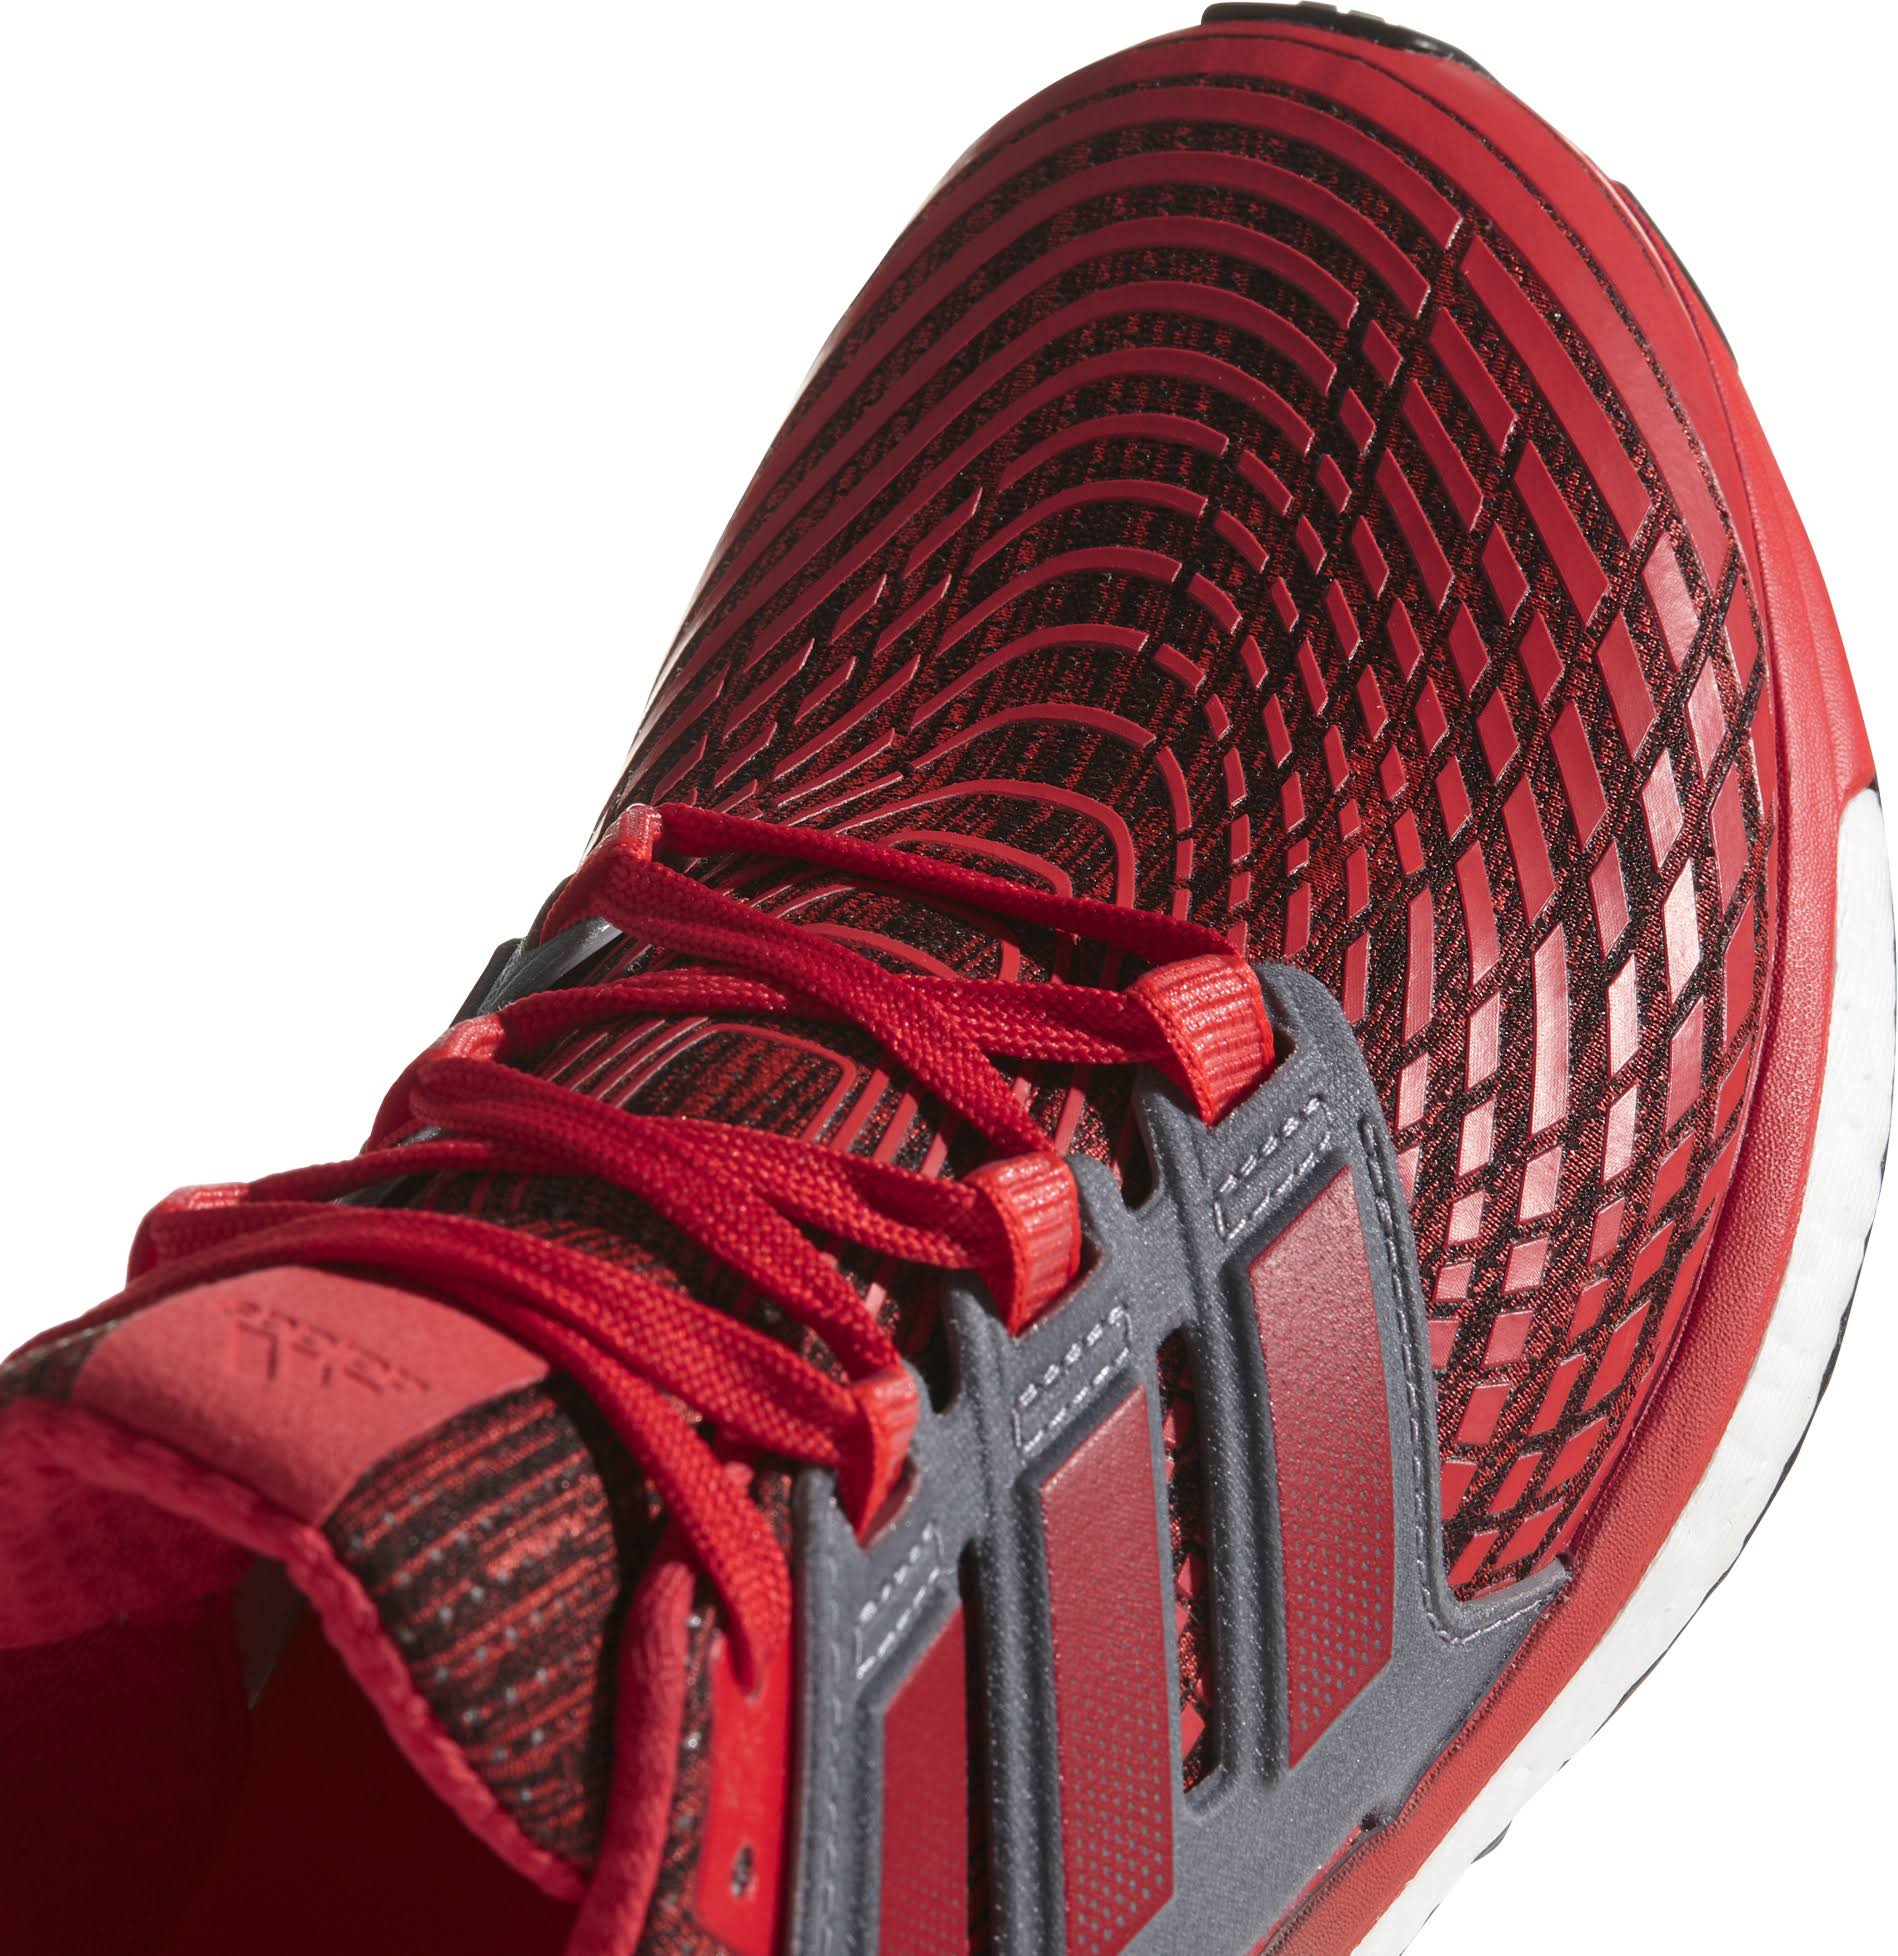 Red Aw17 Boost Laufschuhe Uk Rot 5 8 Adidas Energy Grau Herren wpBOxdqZ